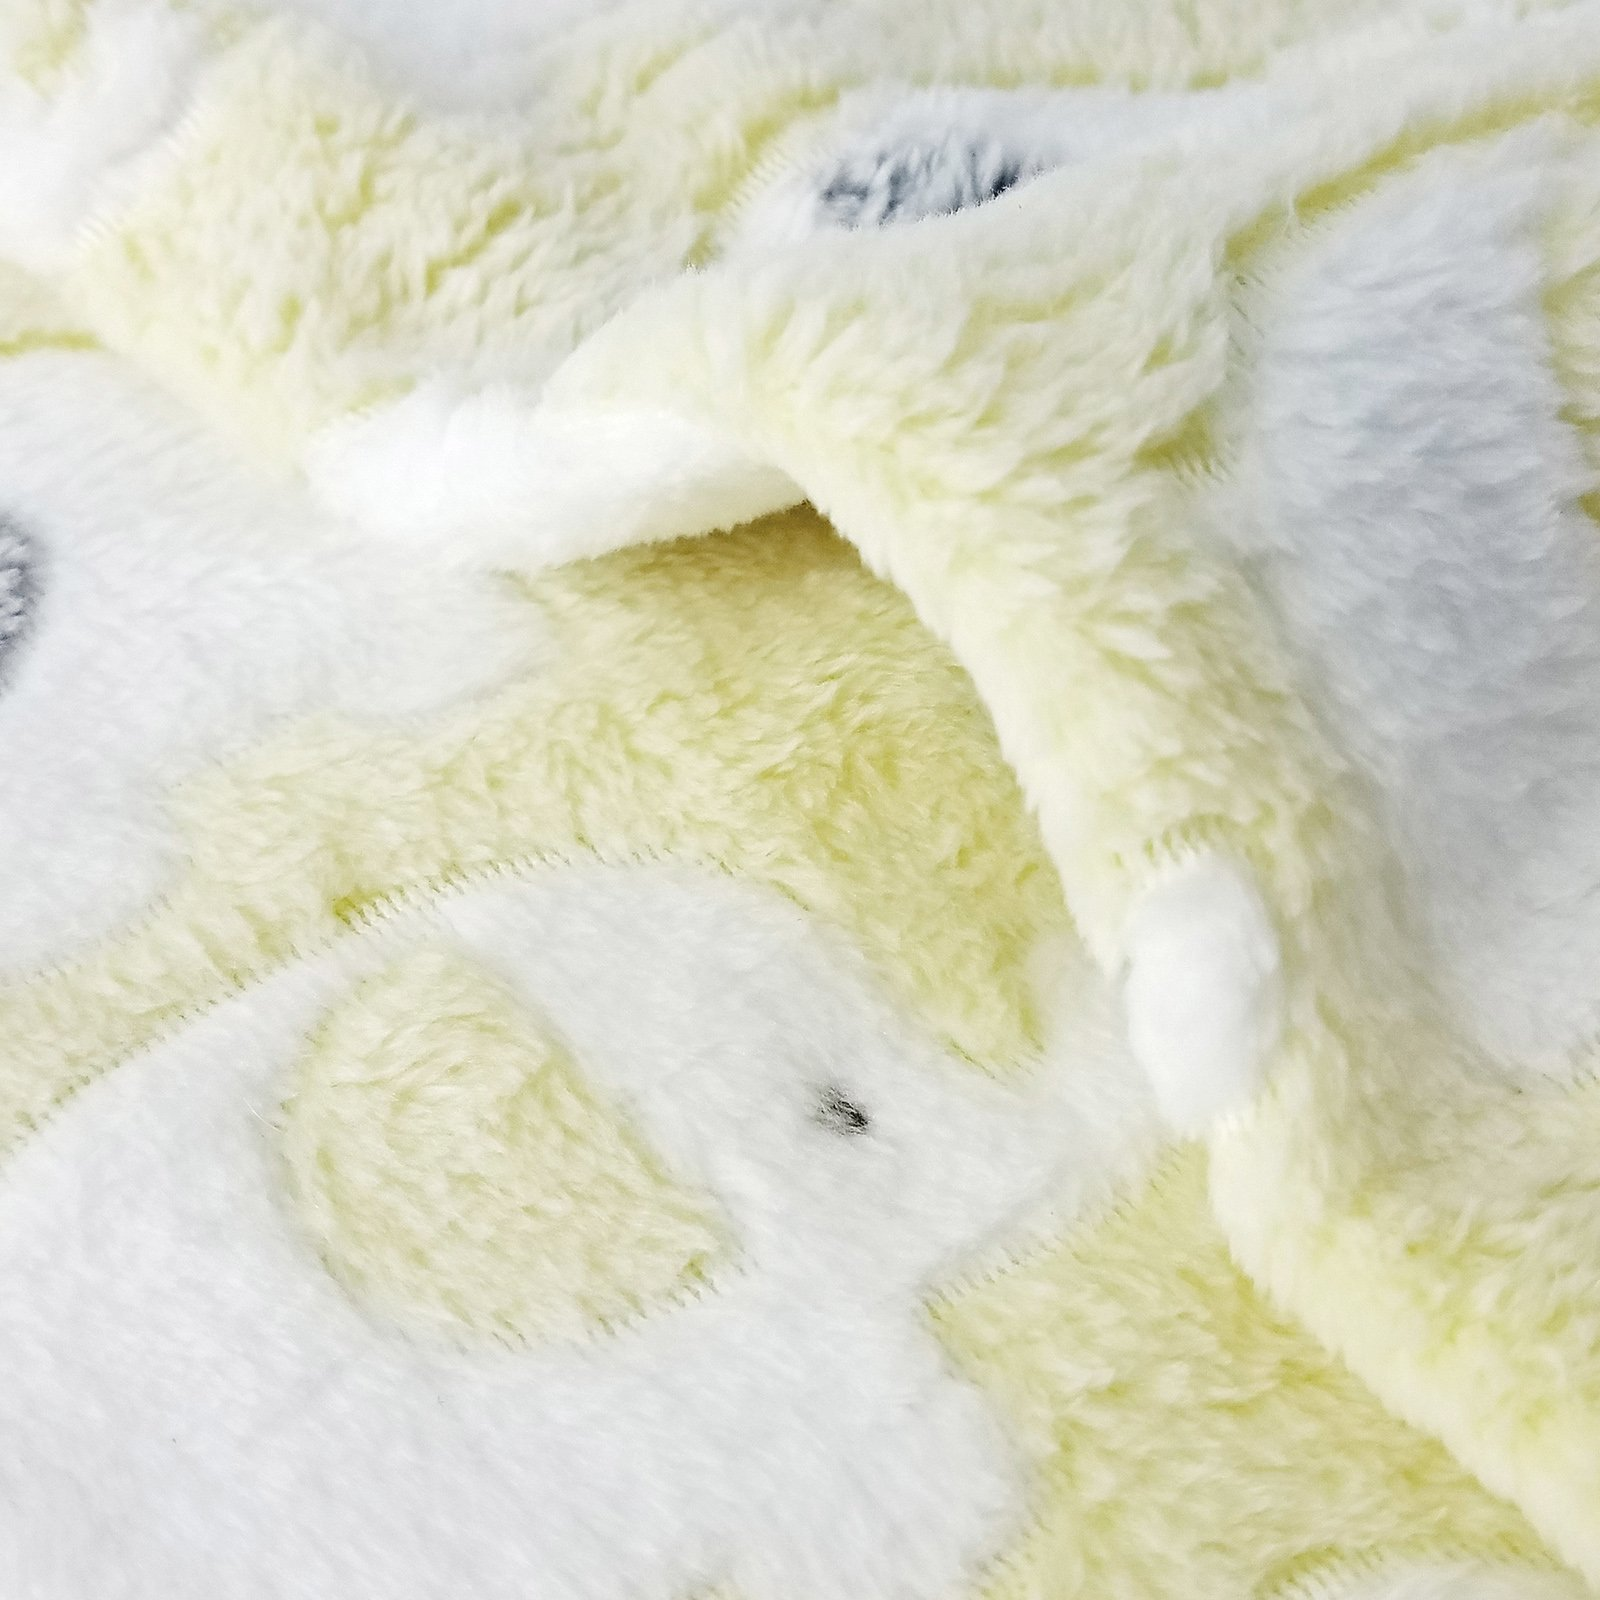 2 Packs Large 43'' x 35'' Cat Blanket Yellow Soft Warm Fleece Throw Blanket Pet Dog Blanket Fleece Puppy Blanket Cushion Ultra Light Comfortable Soft Warm Sleep Mat by Yizhi Miaow (Image #3)